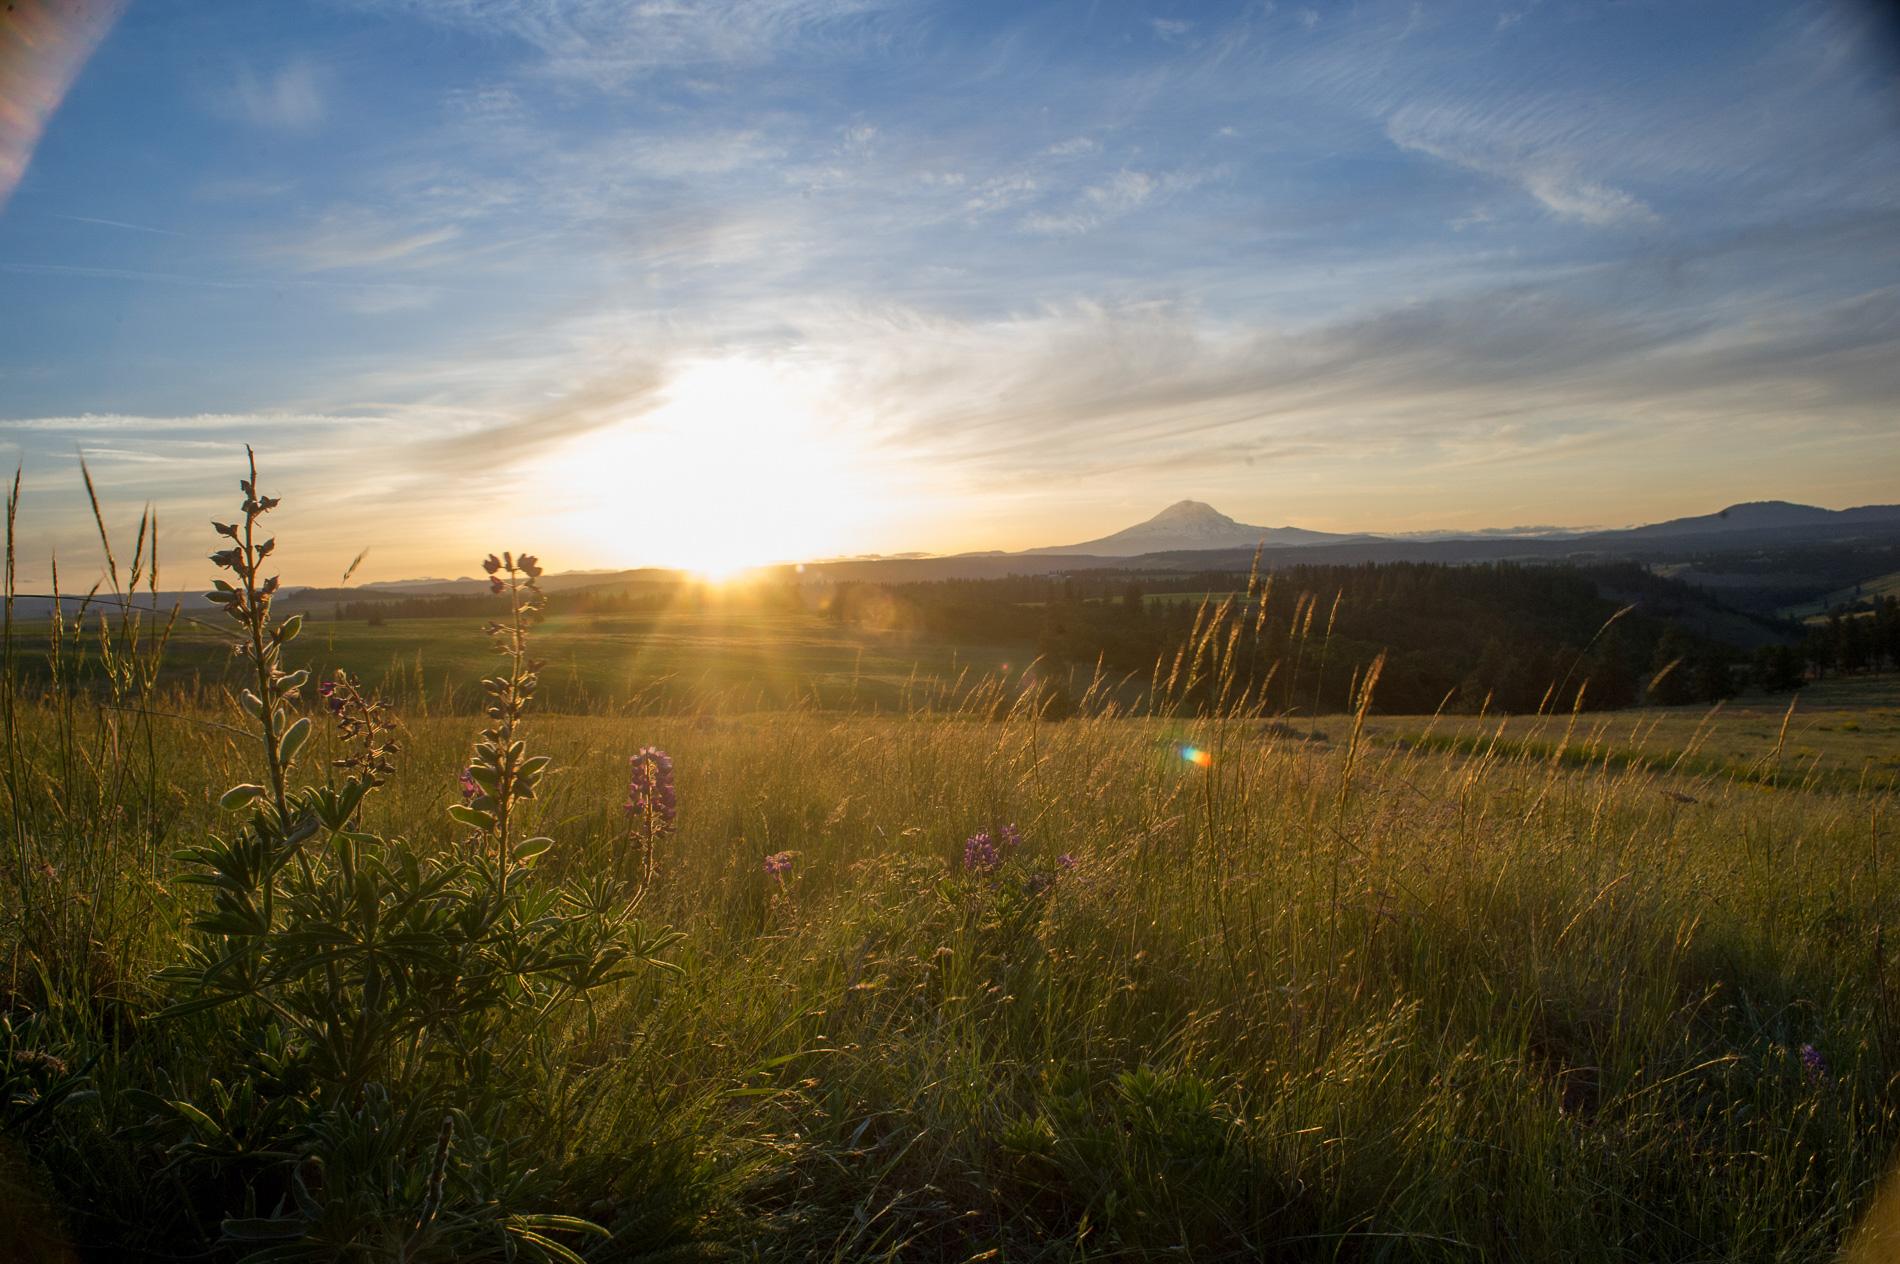 Mount Adams at Sunset